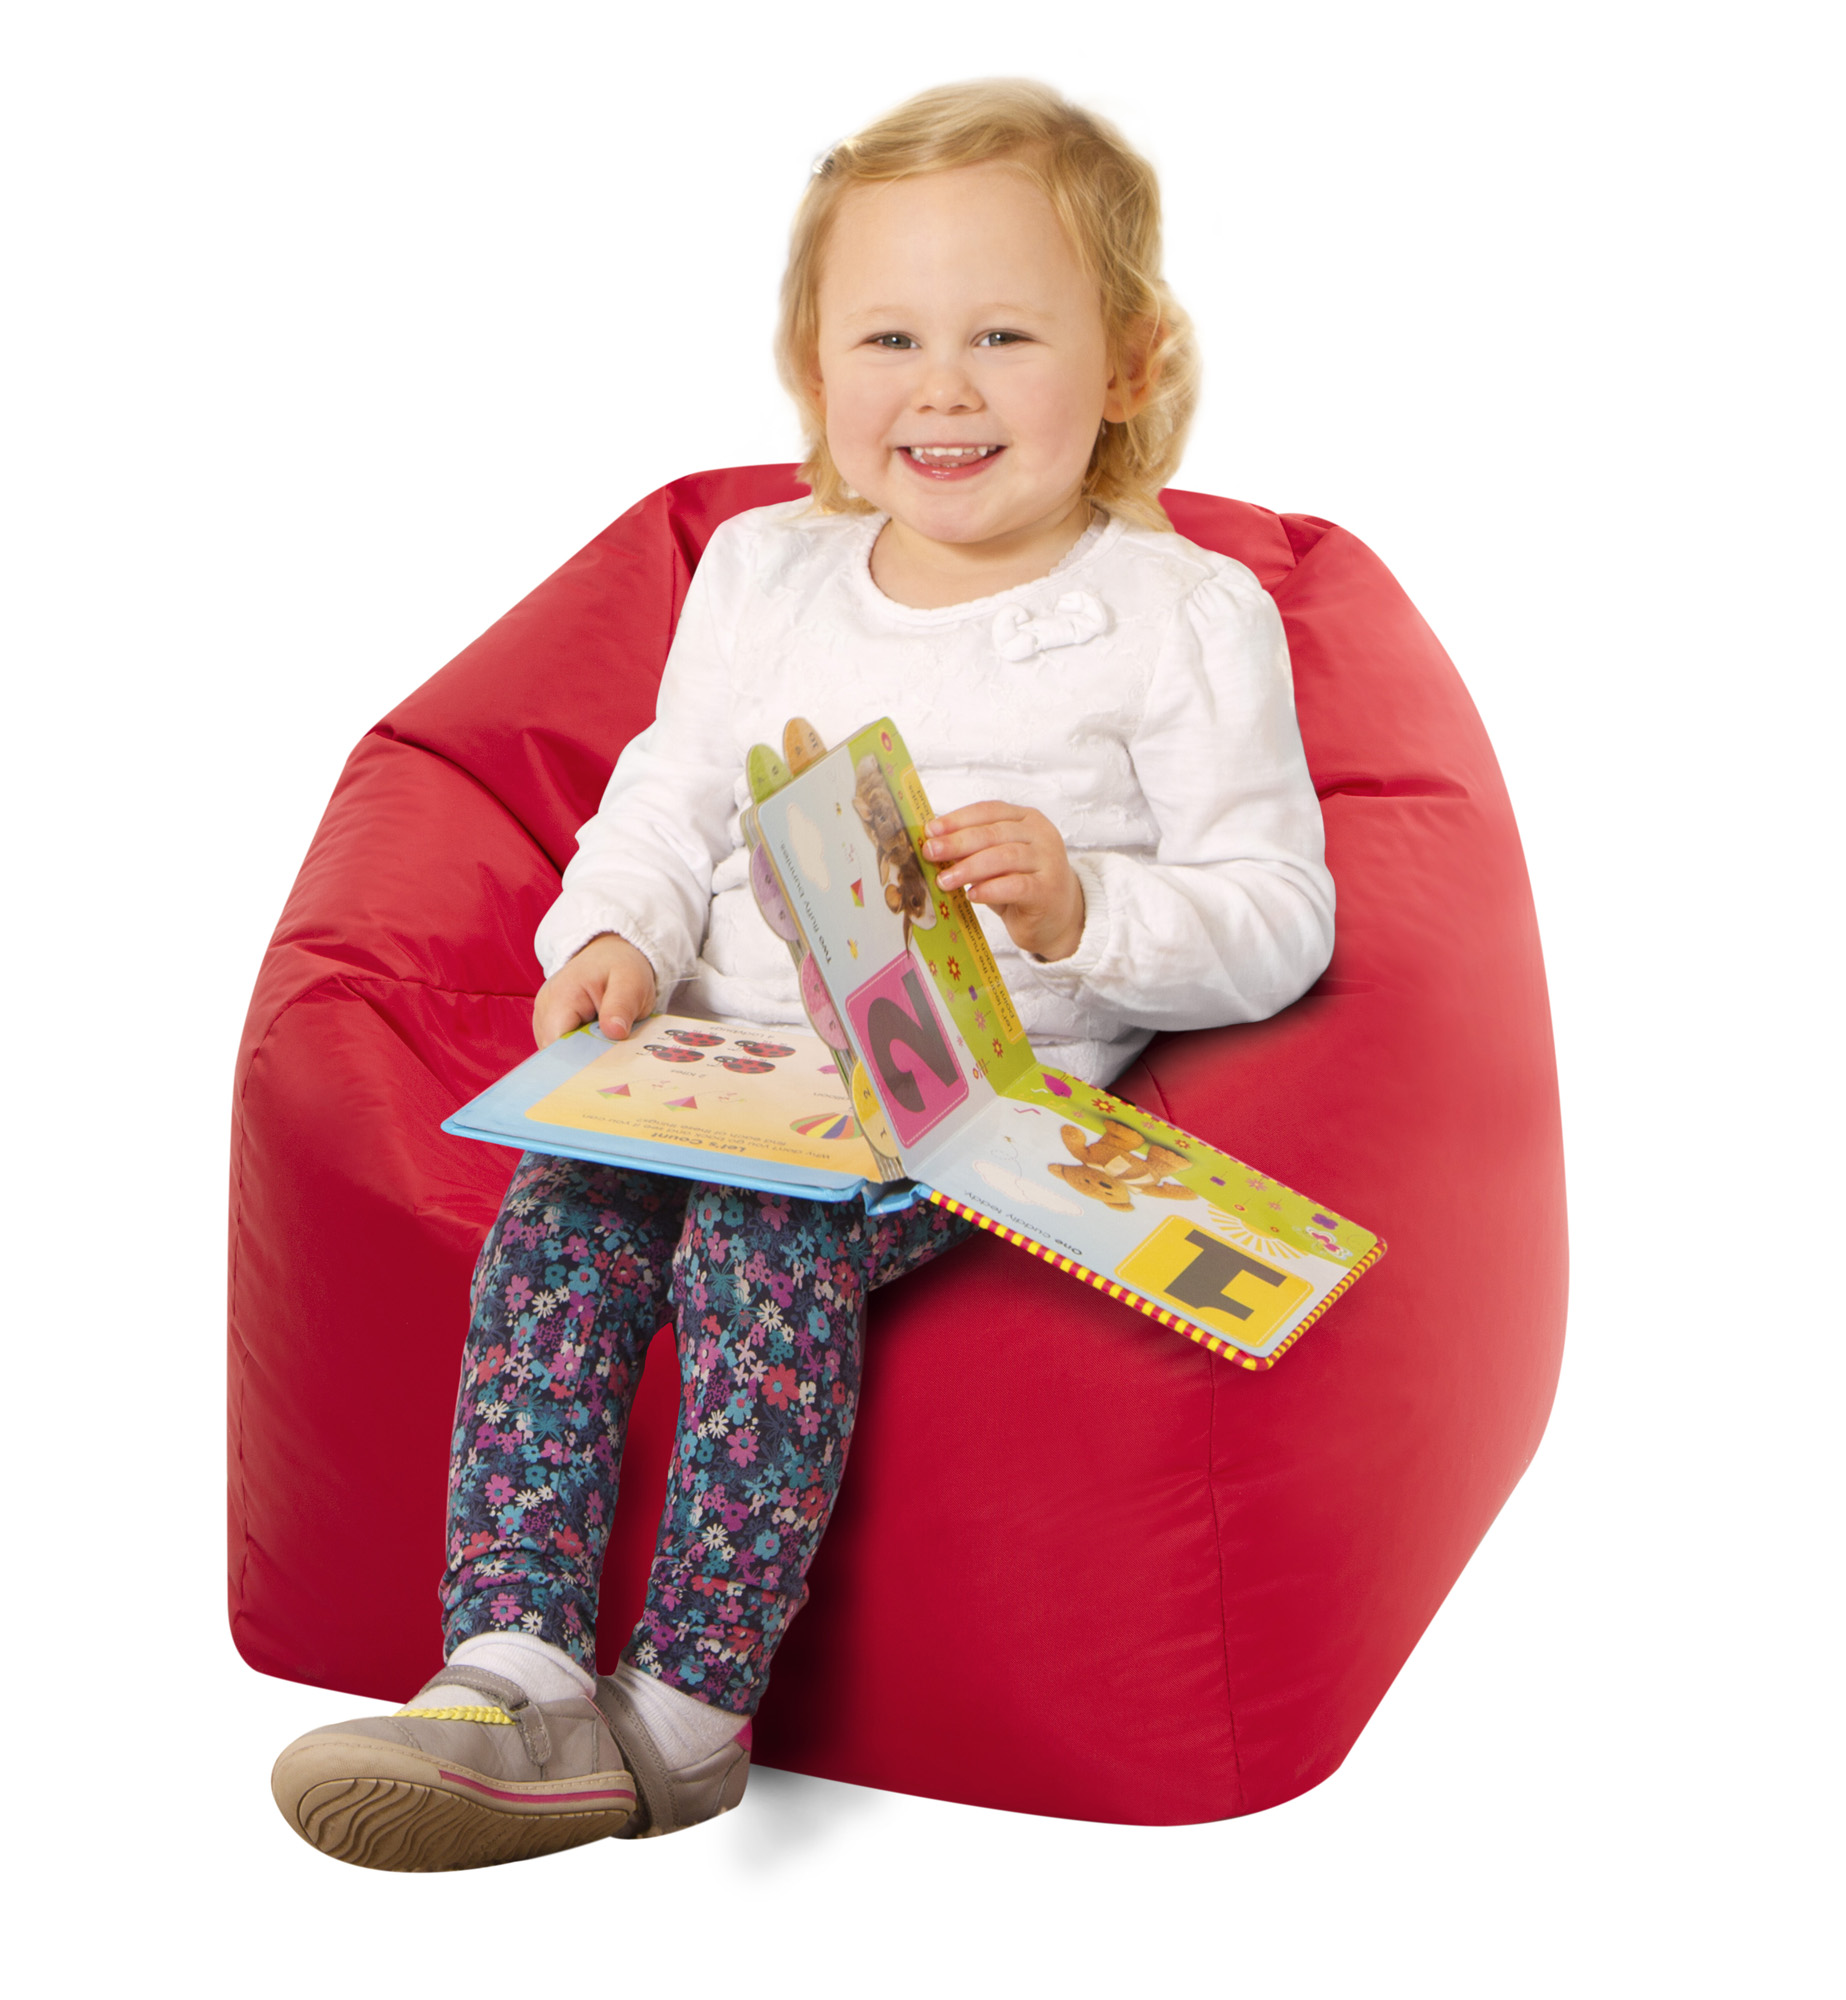 Eden-New-Nursery-Beanbag-red-300dpi-1